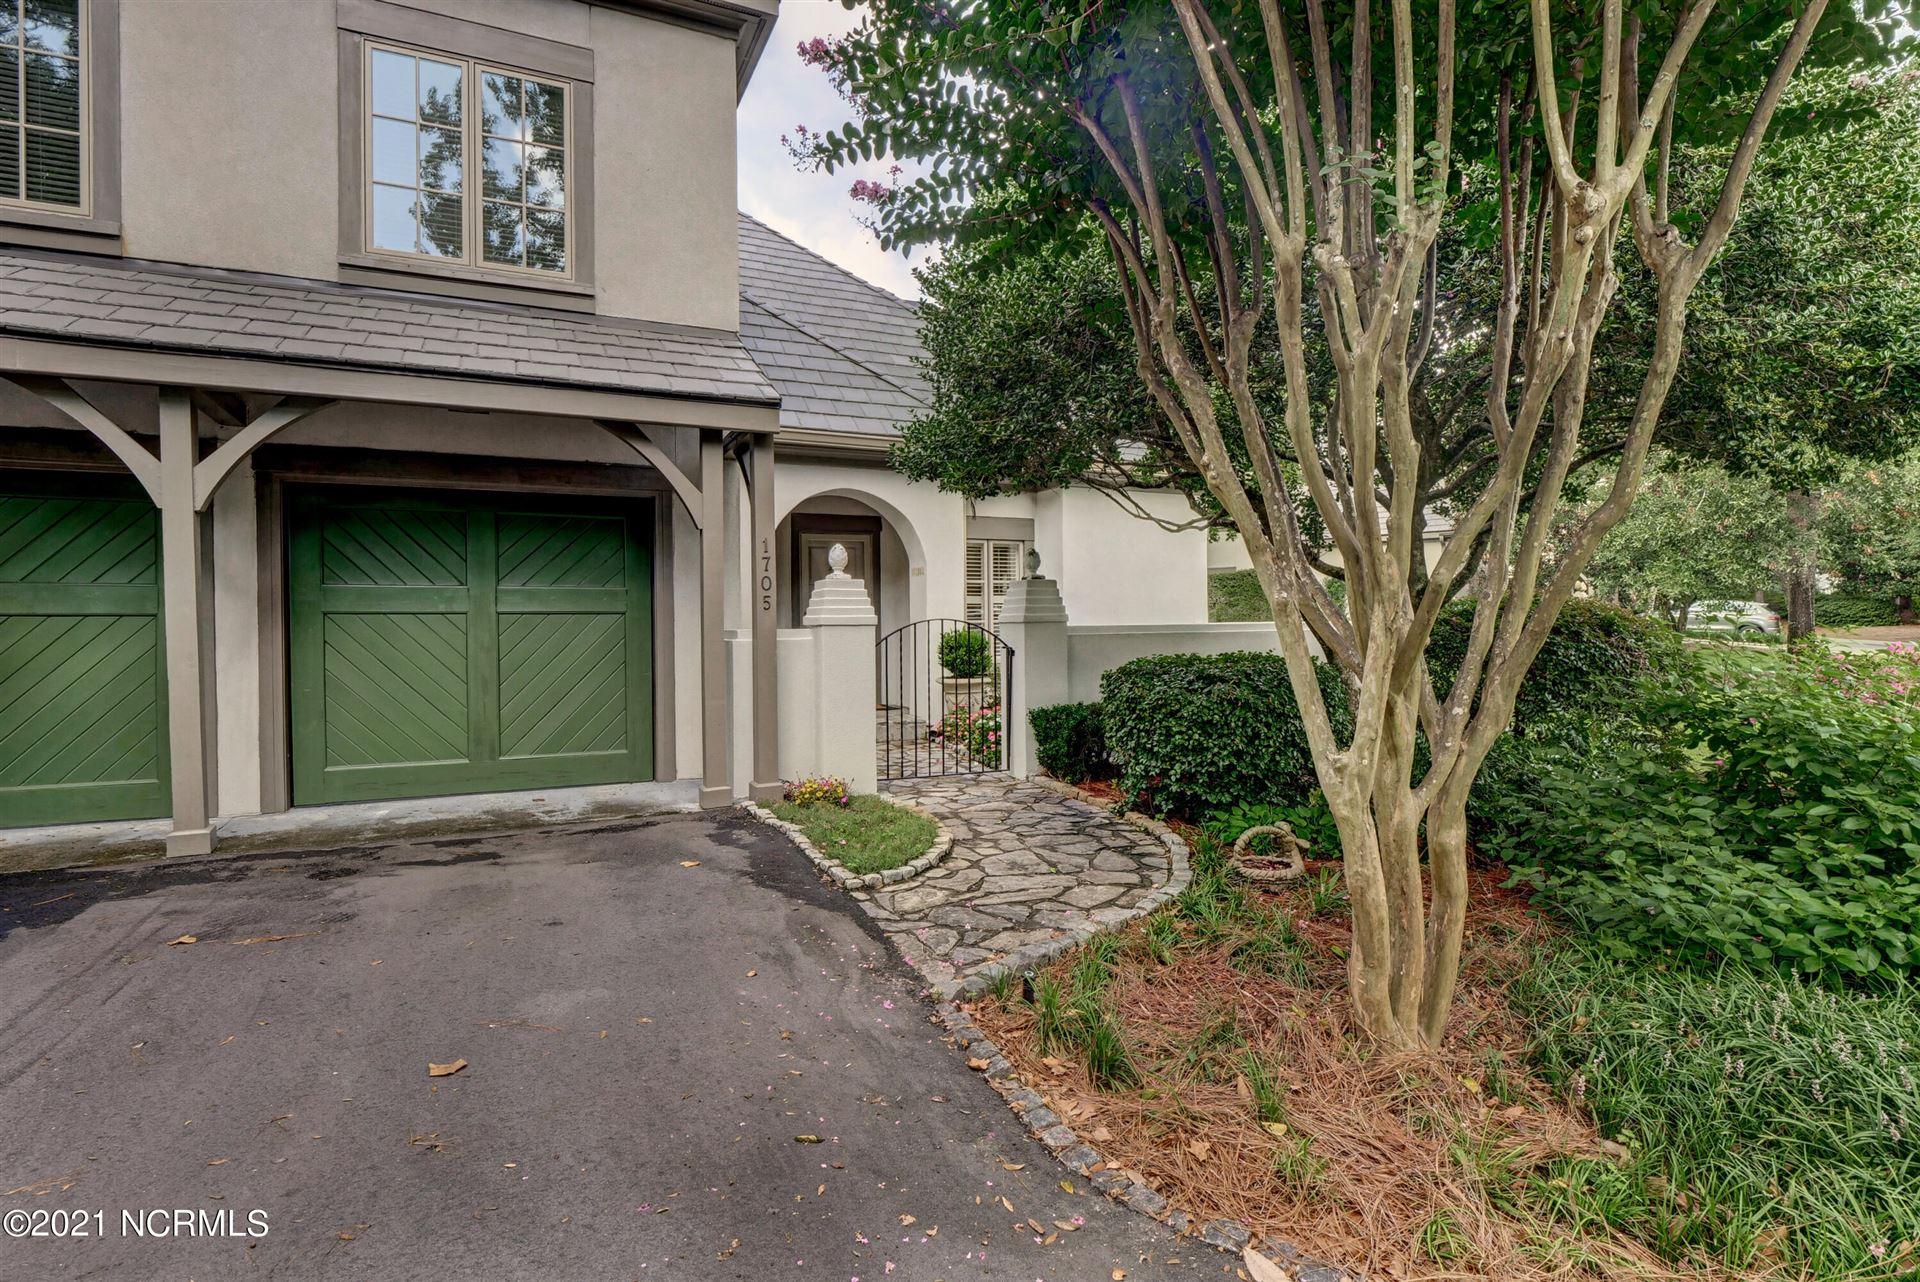 Photo of 1705 Fontenay Place, Wilmington, NC 28405 (MLS # 100288194)